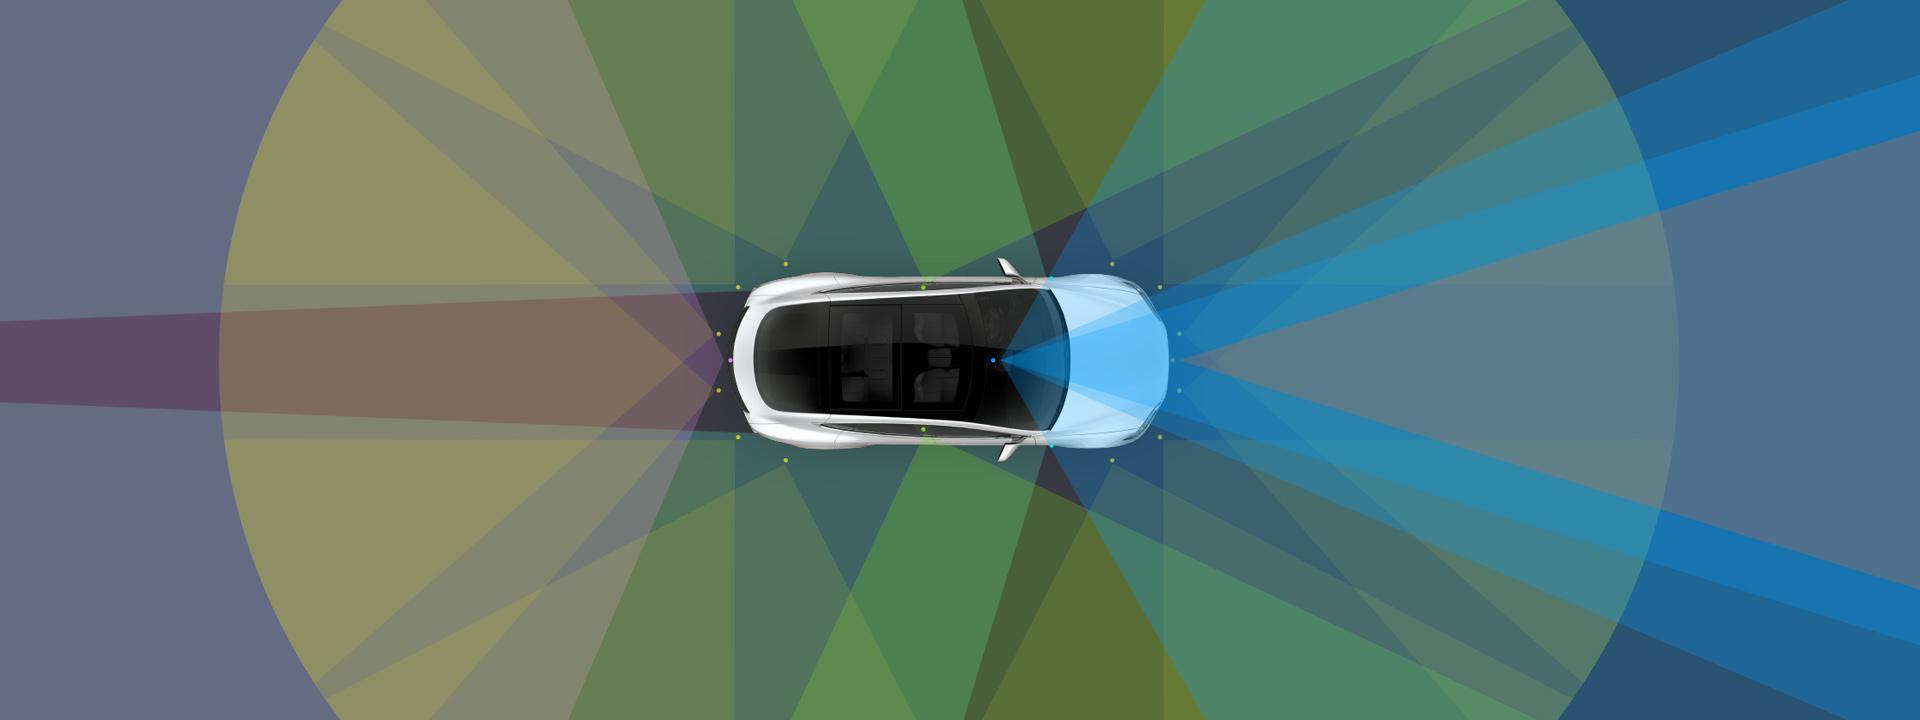 tesla autopilot system set to improve in future